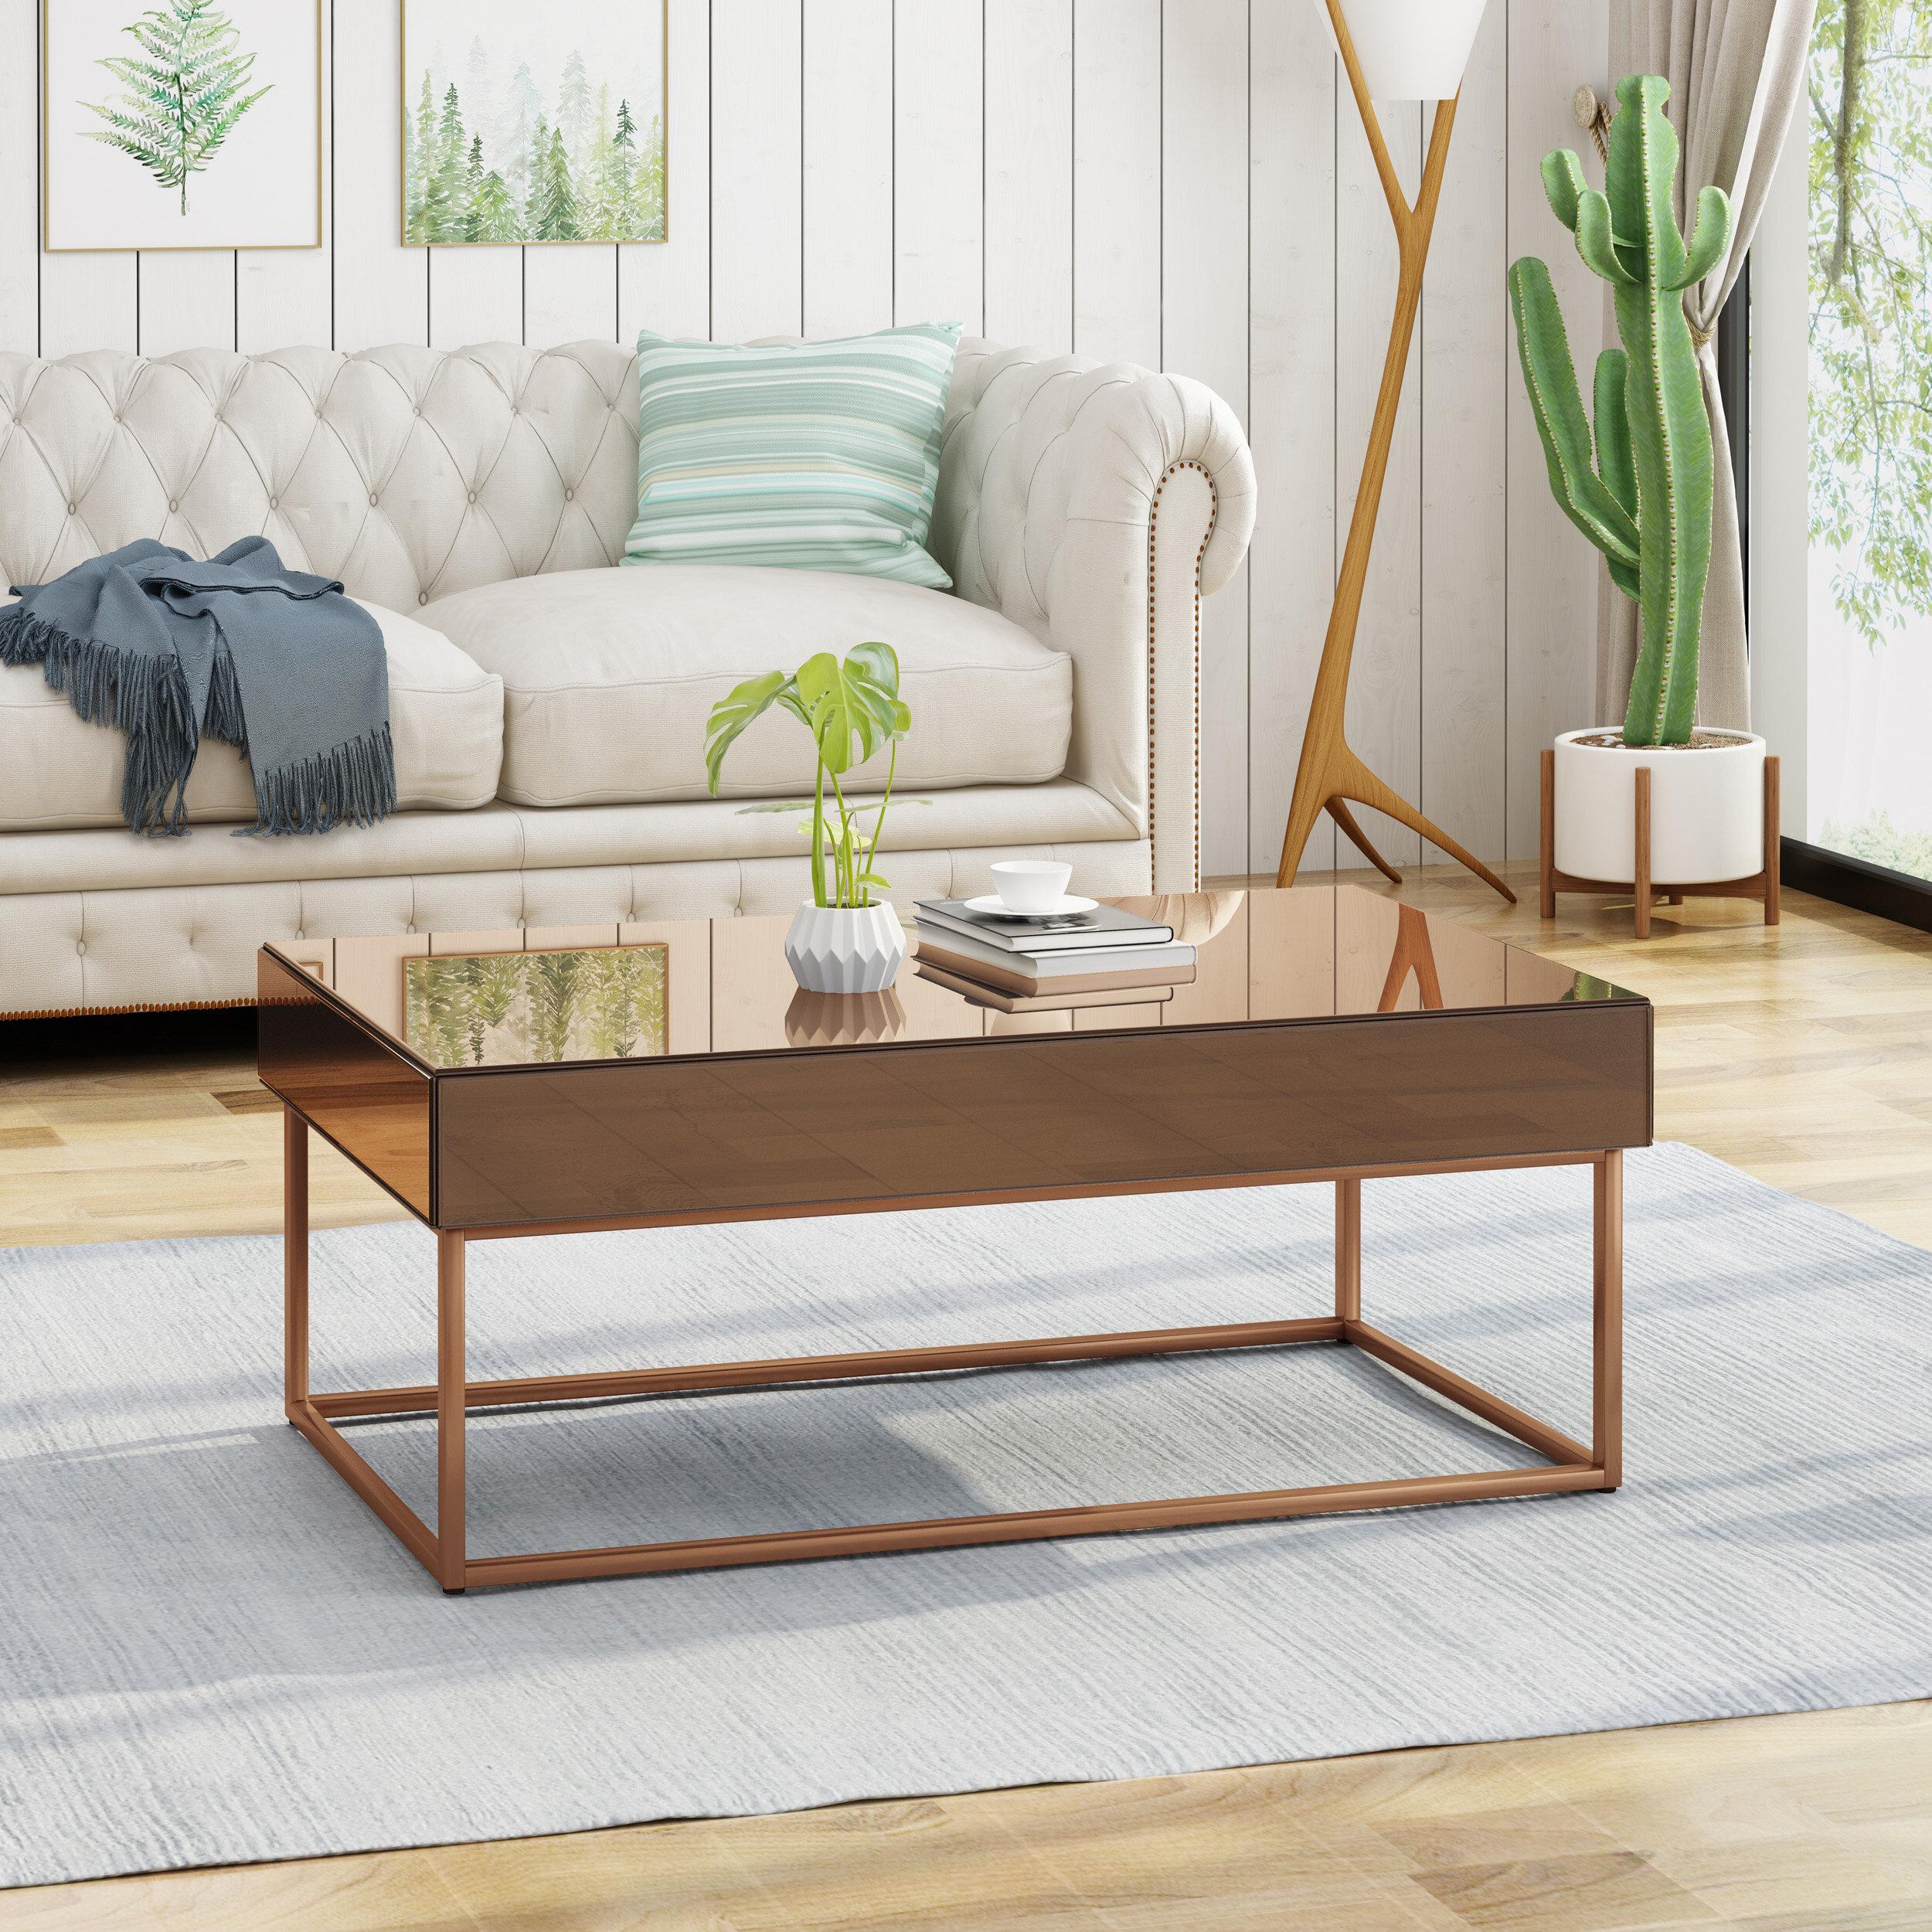 Wrought studio mcchristian modern glam coffee table with storage wayfair